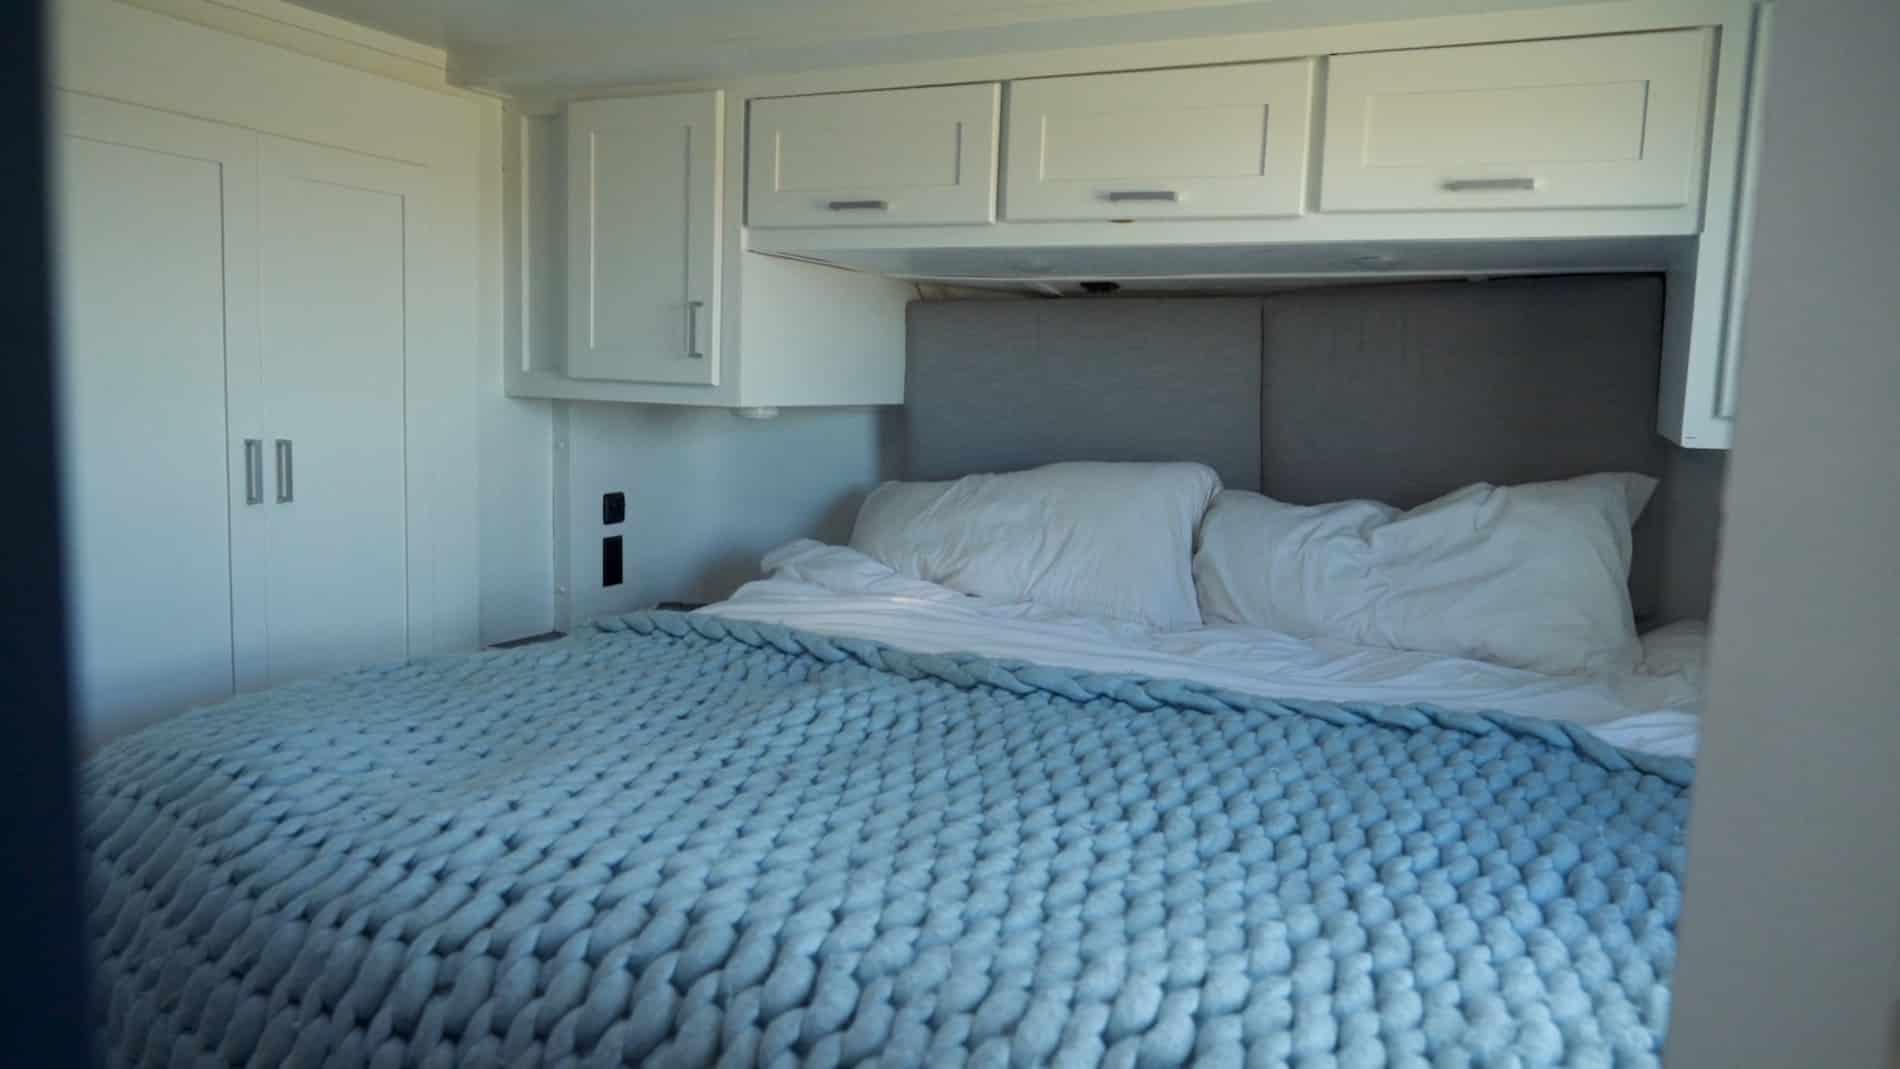 RV bedroom after